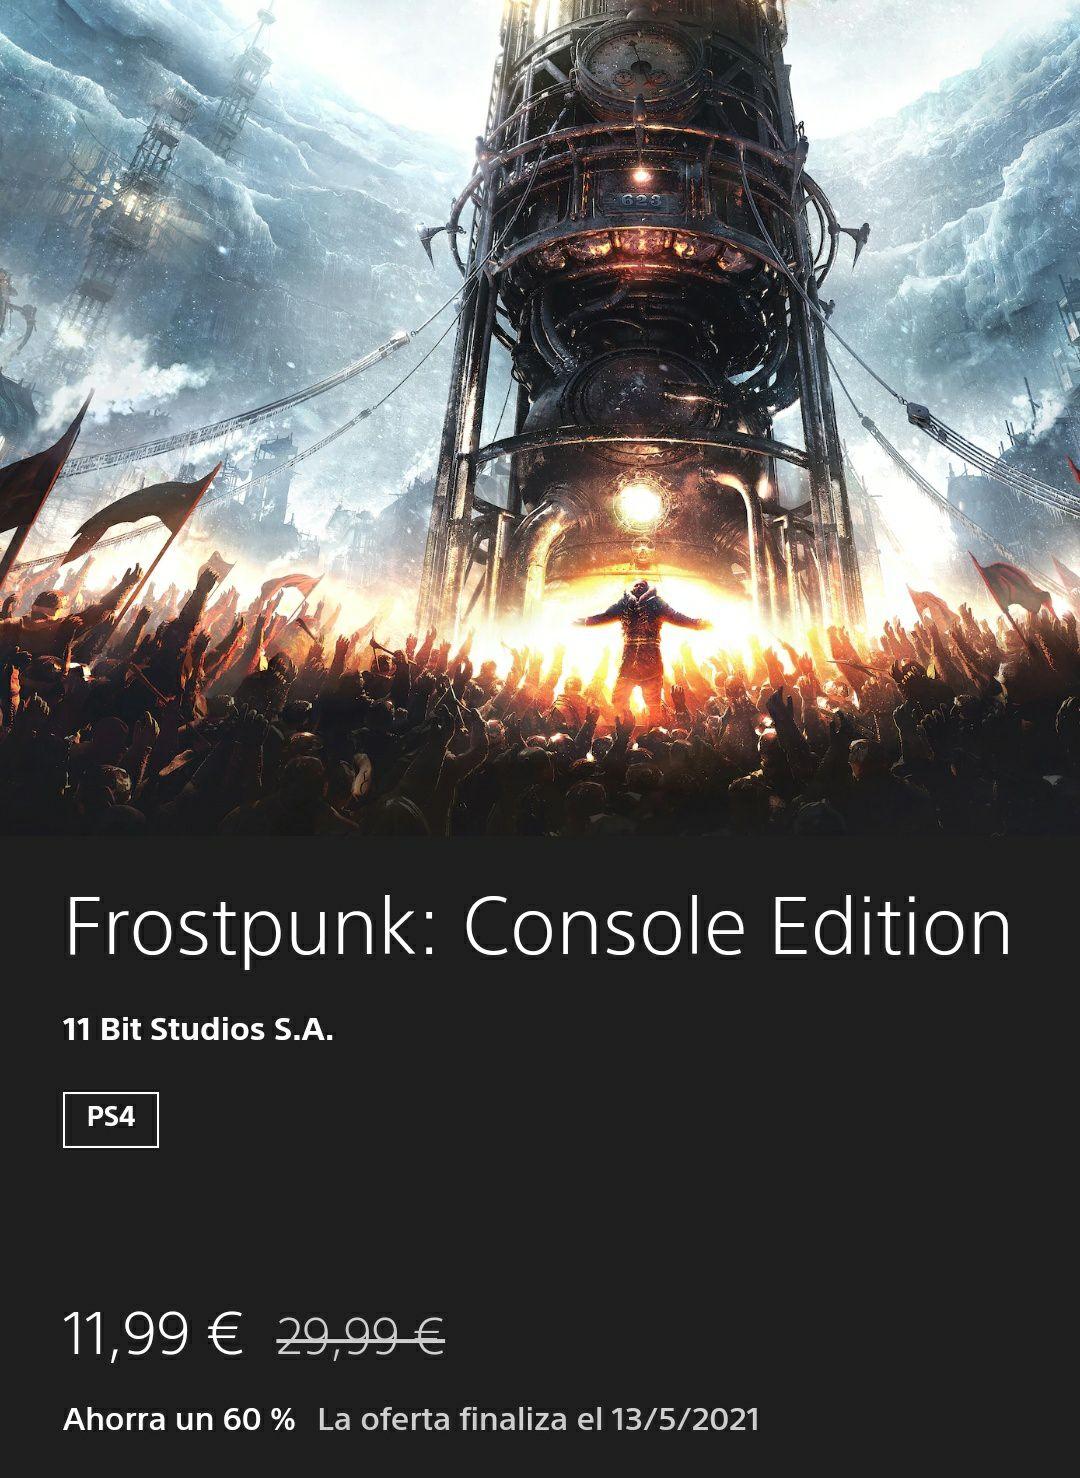 Frostpunk: console edition